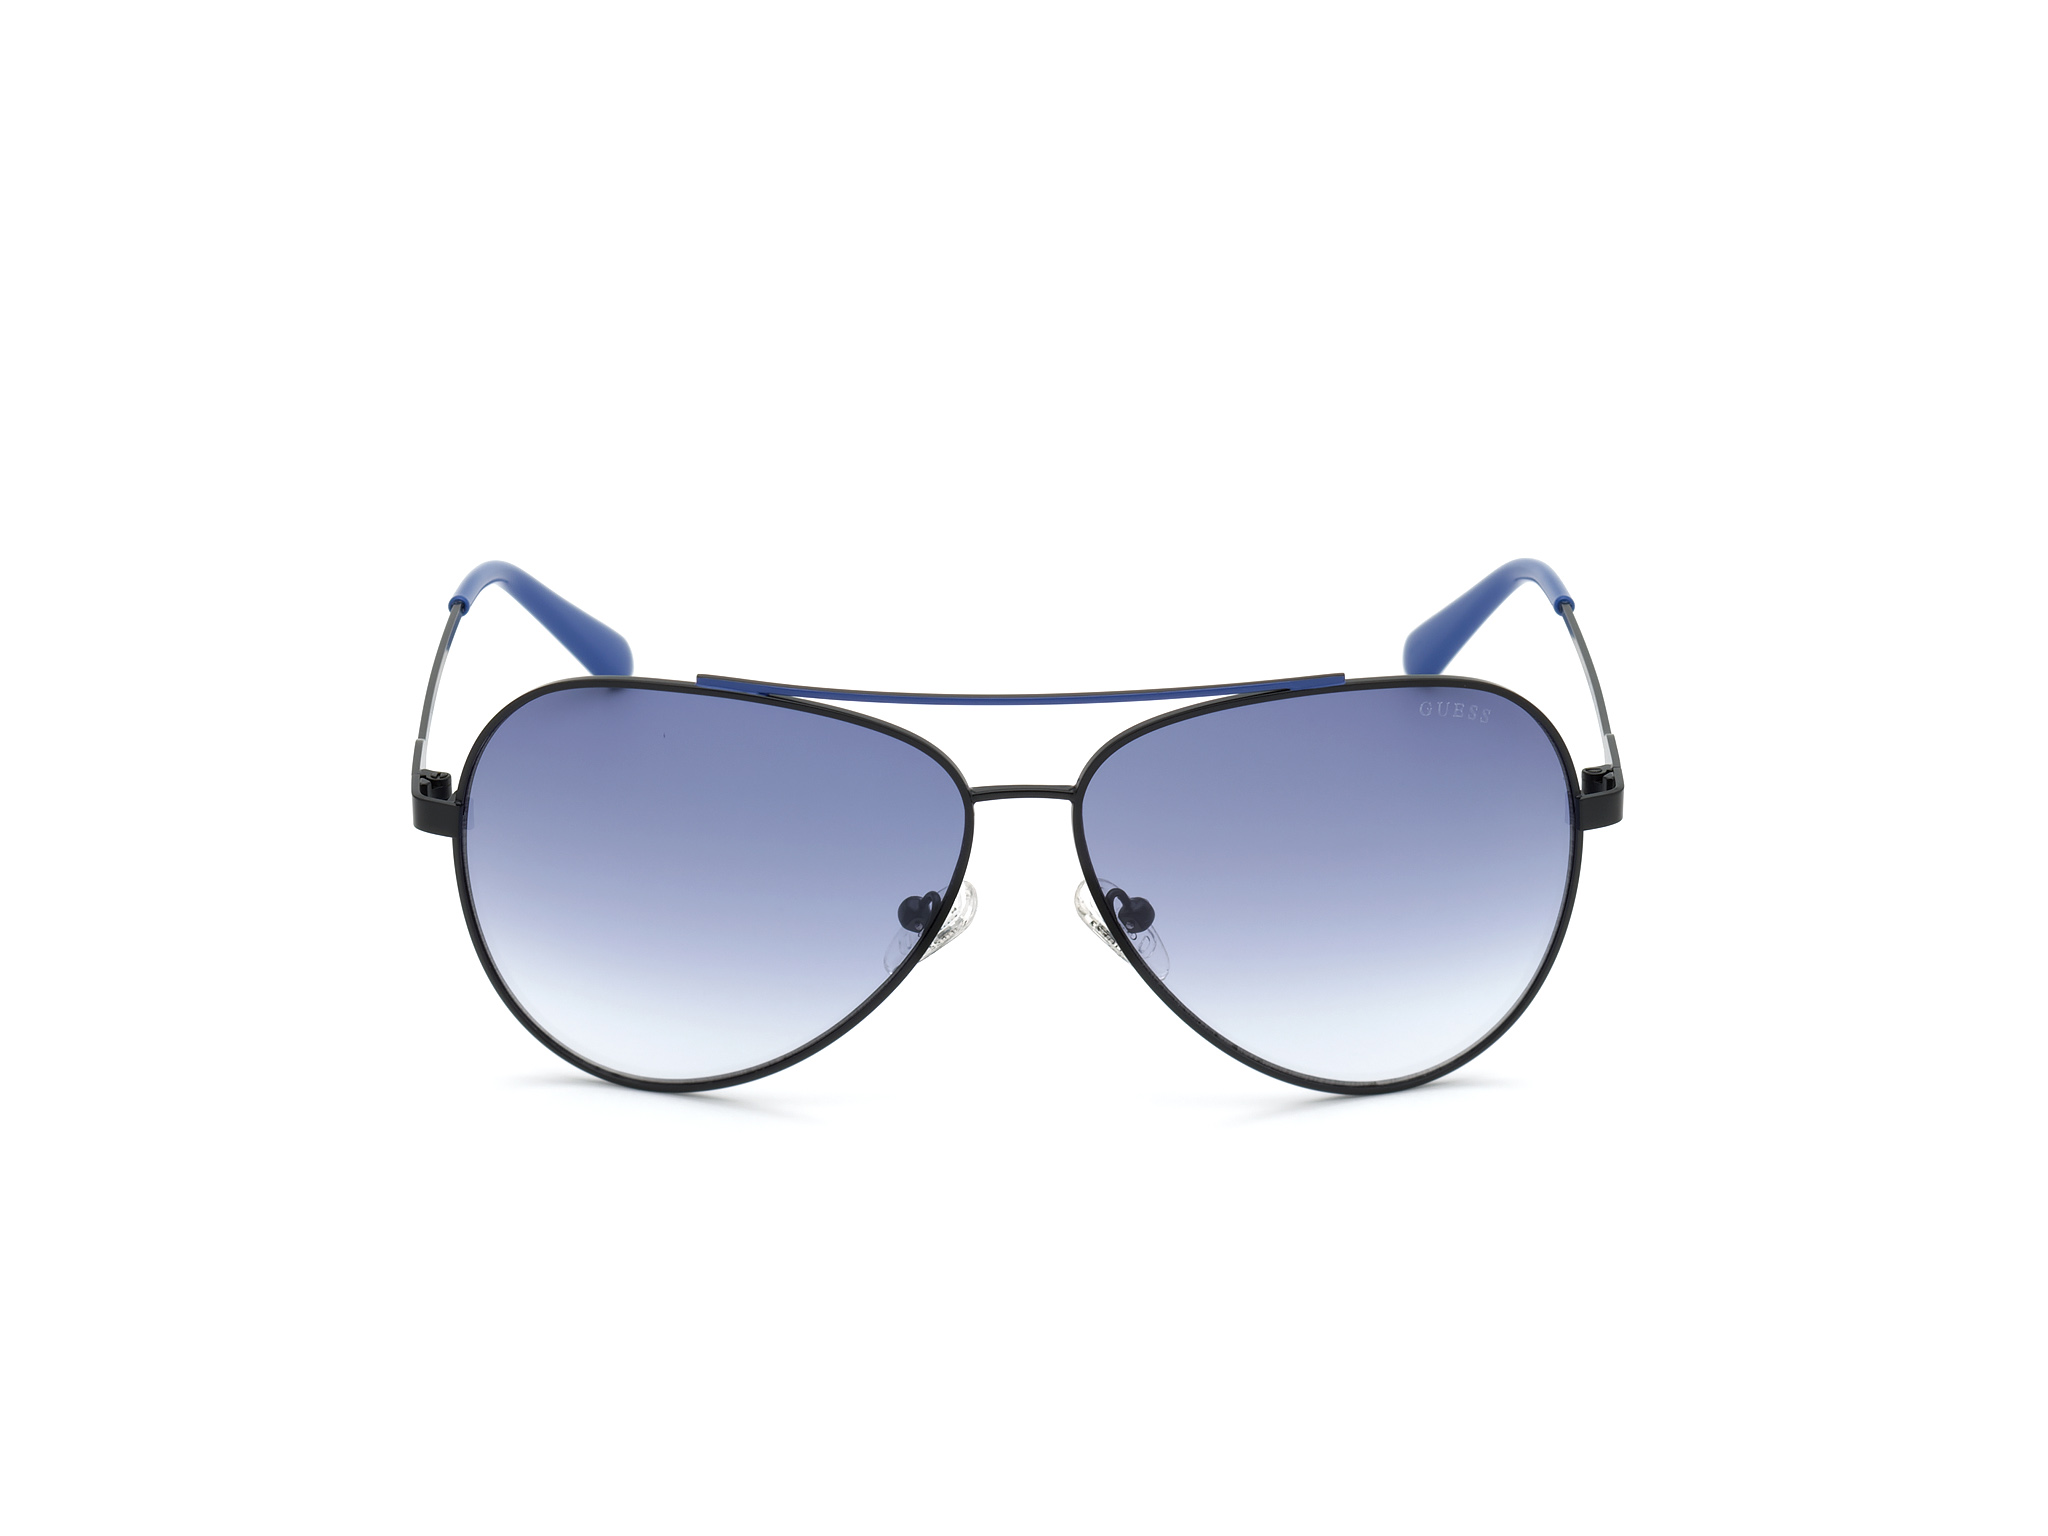 GUESS | Guess Black Frame With Blue Lens Aviator Shape Men Sunglass